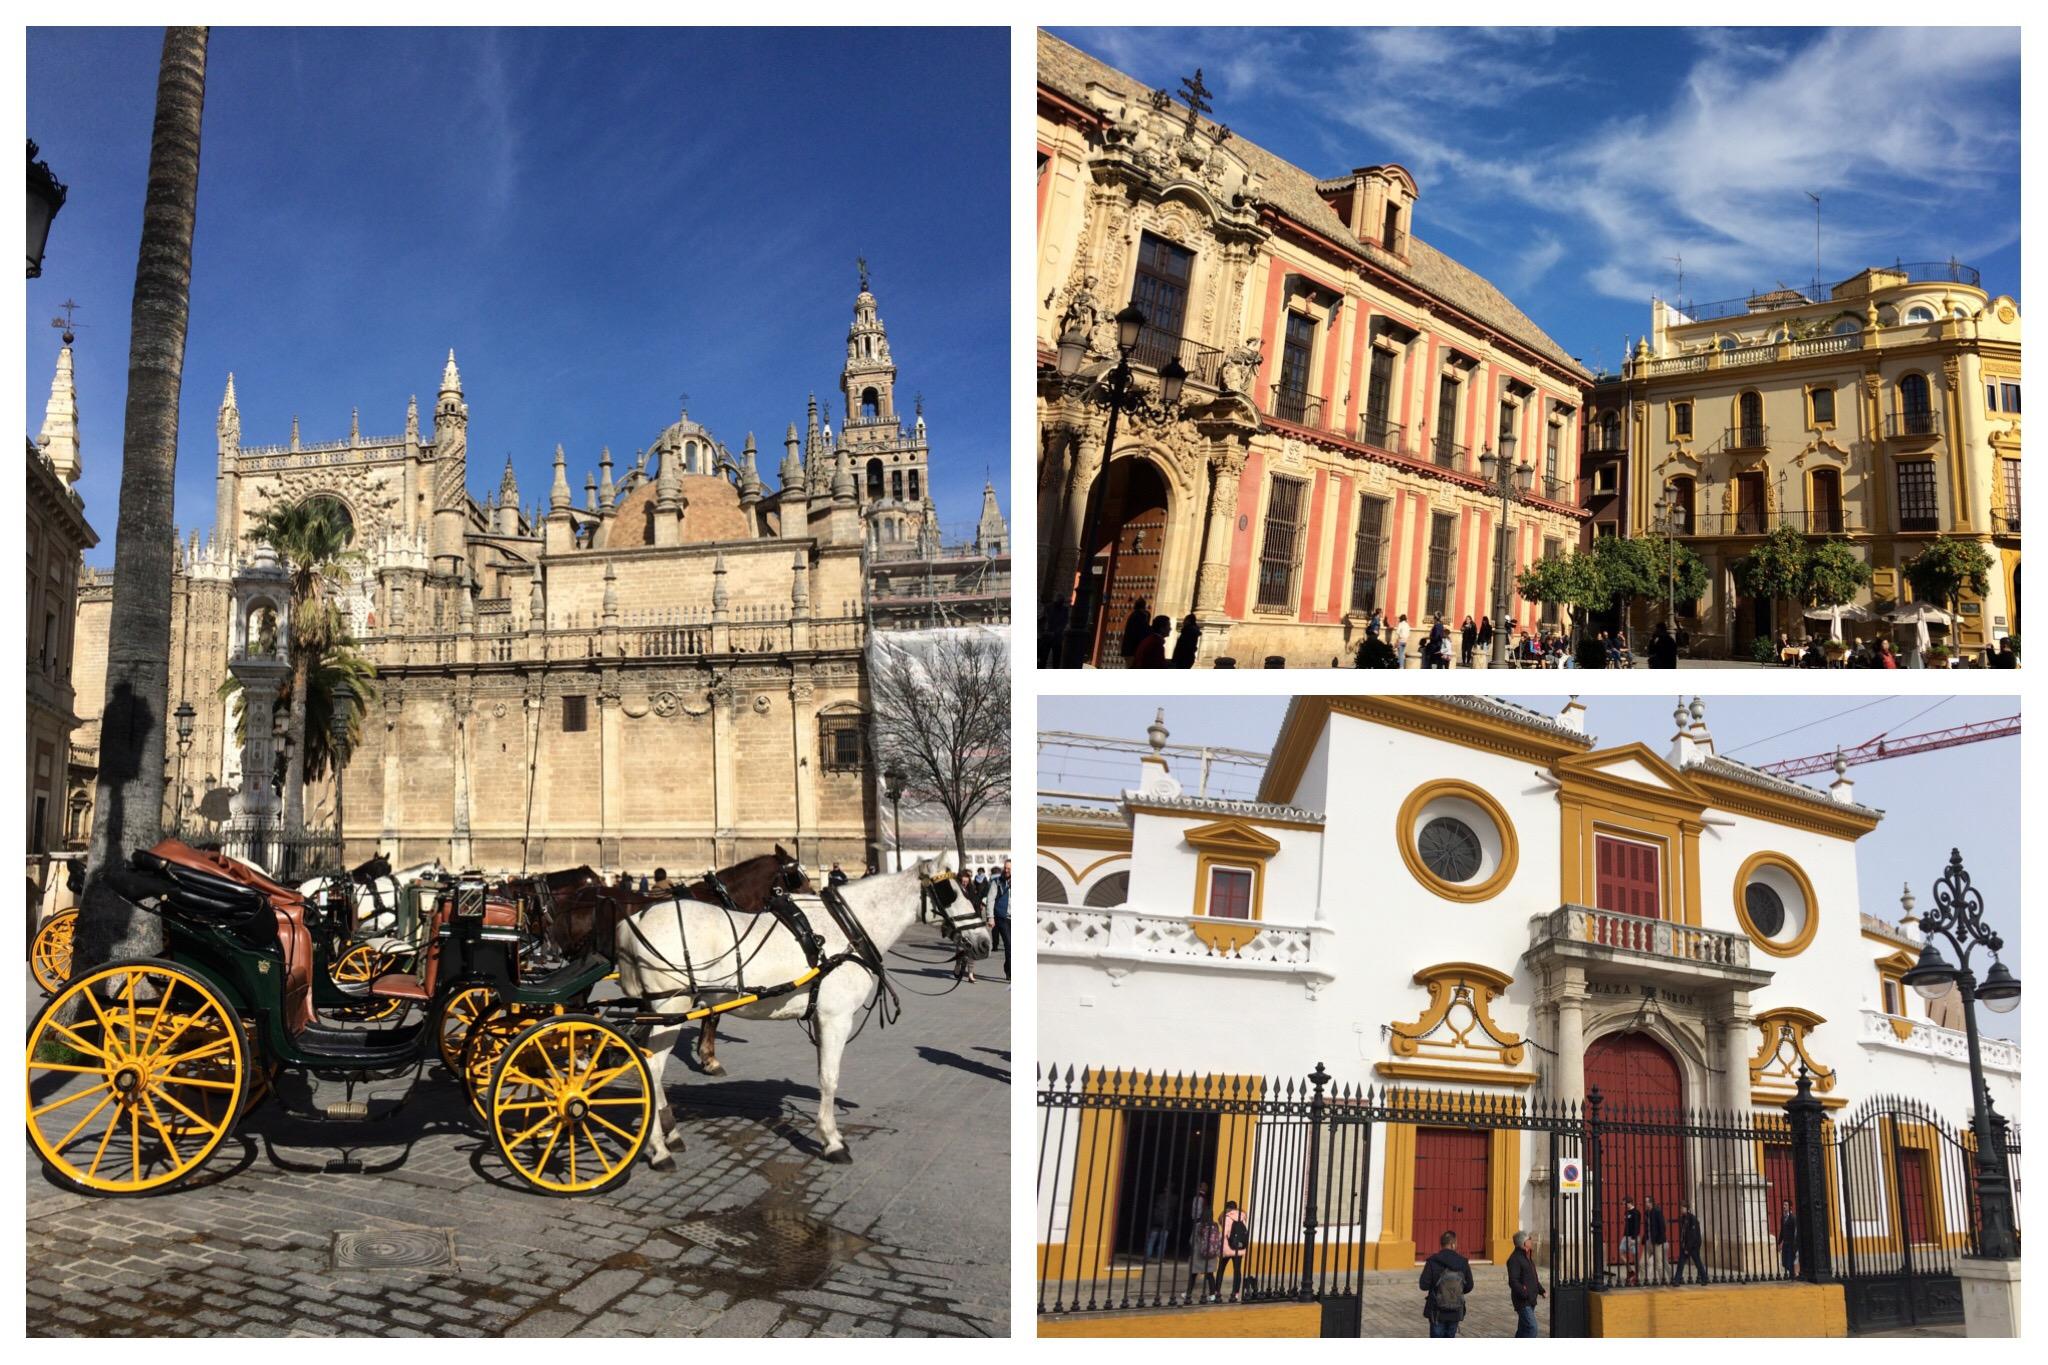 Seville - colourful city